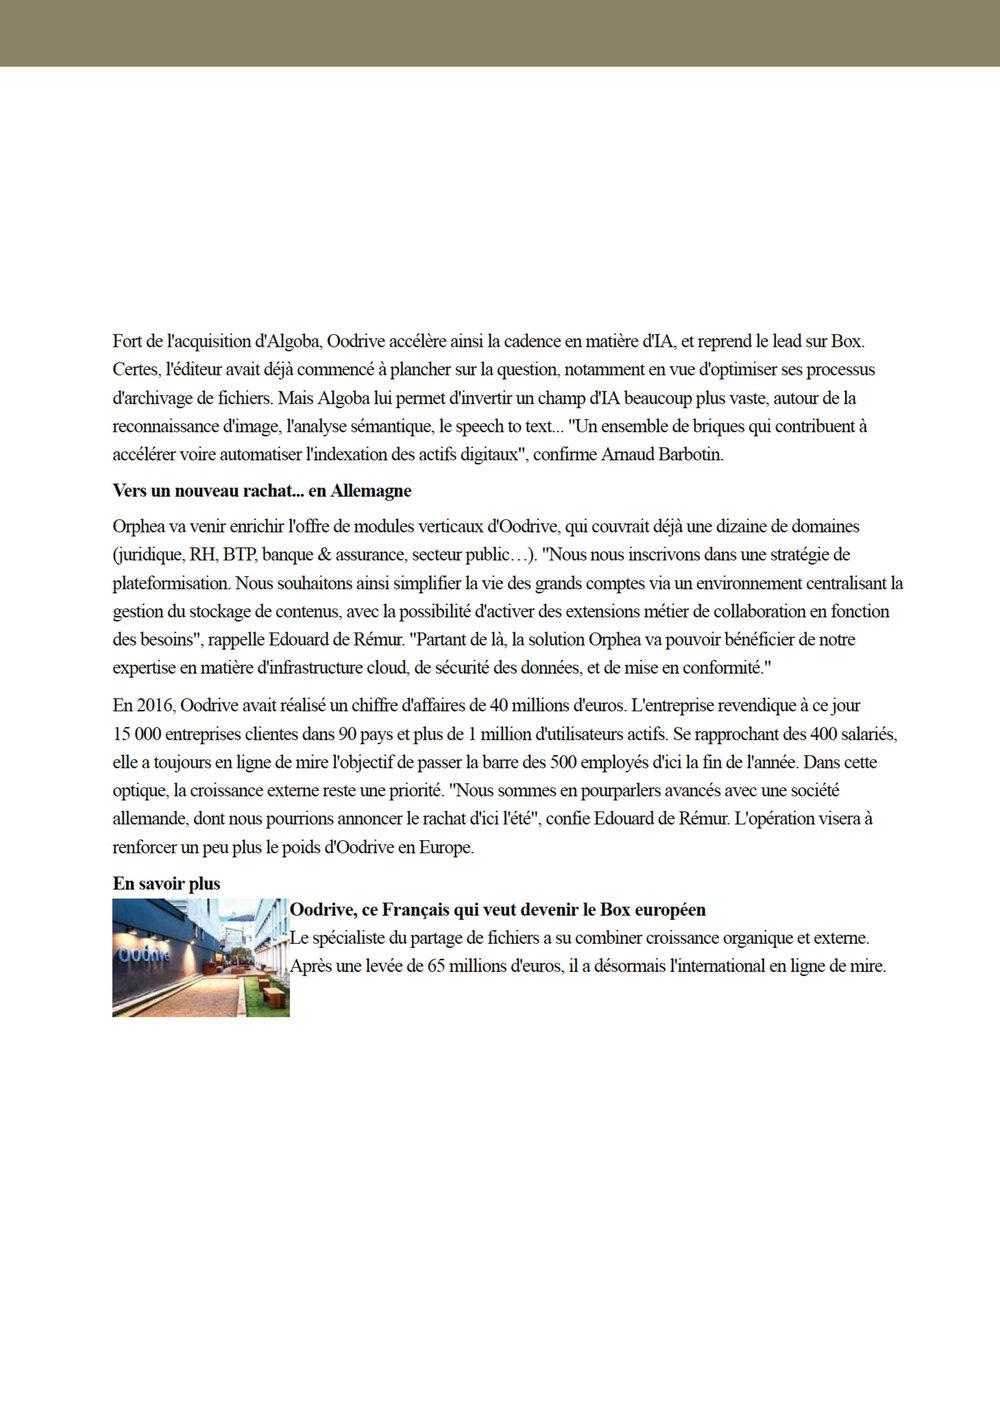 BOOKMEDIA_JANV_WEB31.jpg